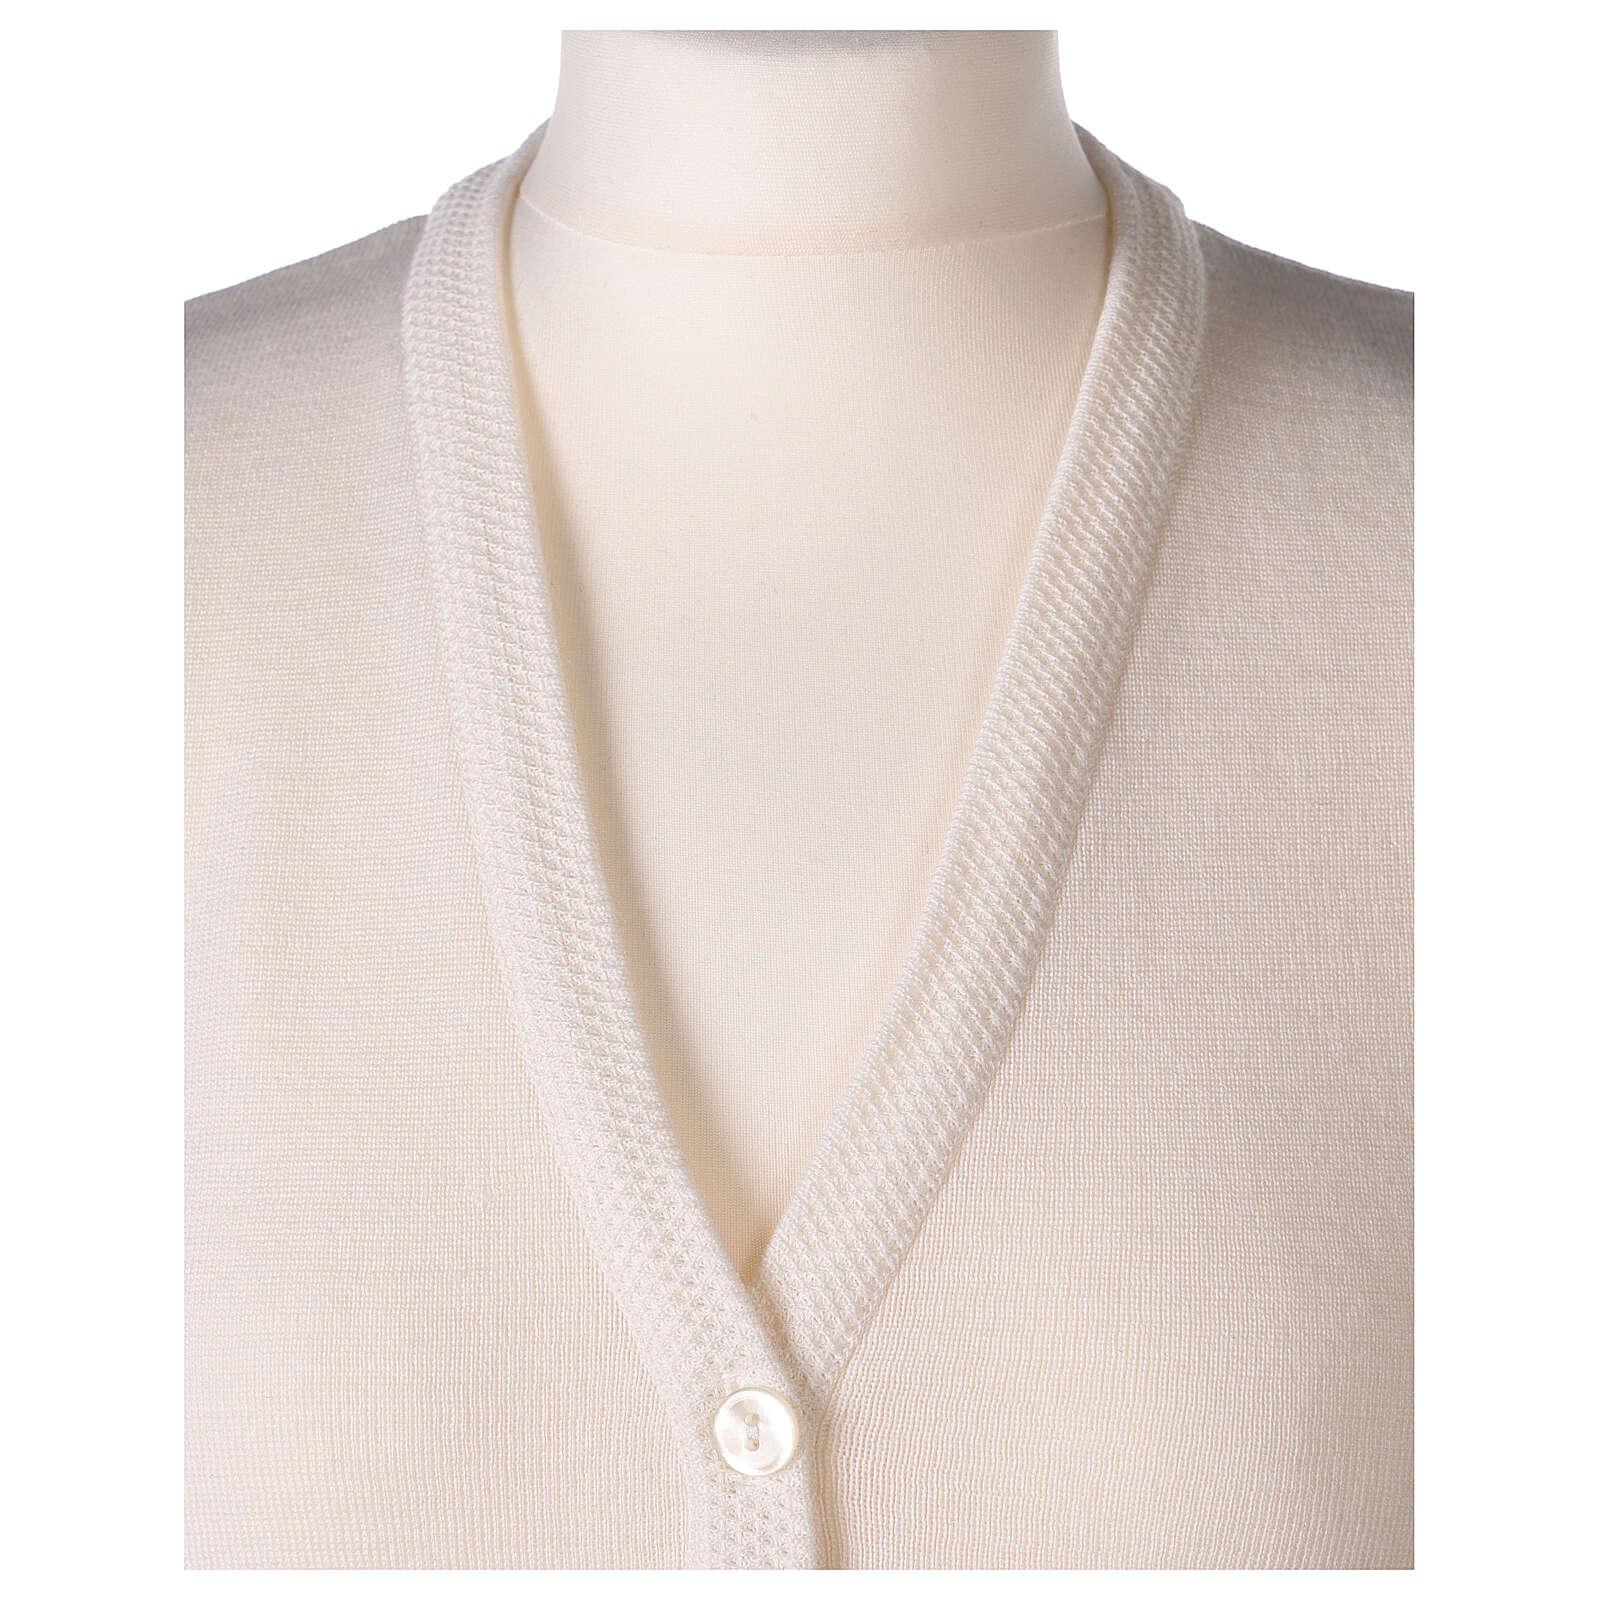 White V-neck sleeveless nun cardigan with pockets 50% acrylic 50% merino wool In Primis 4